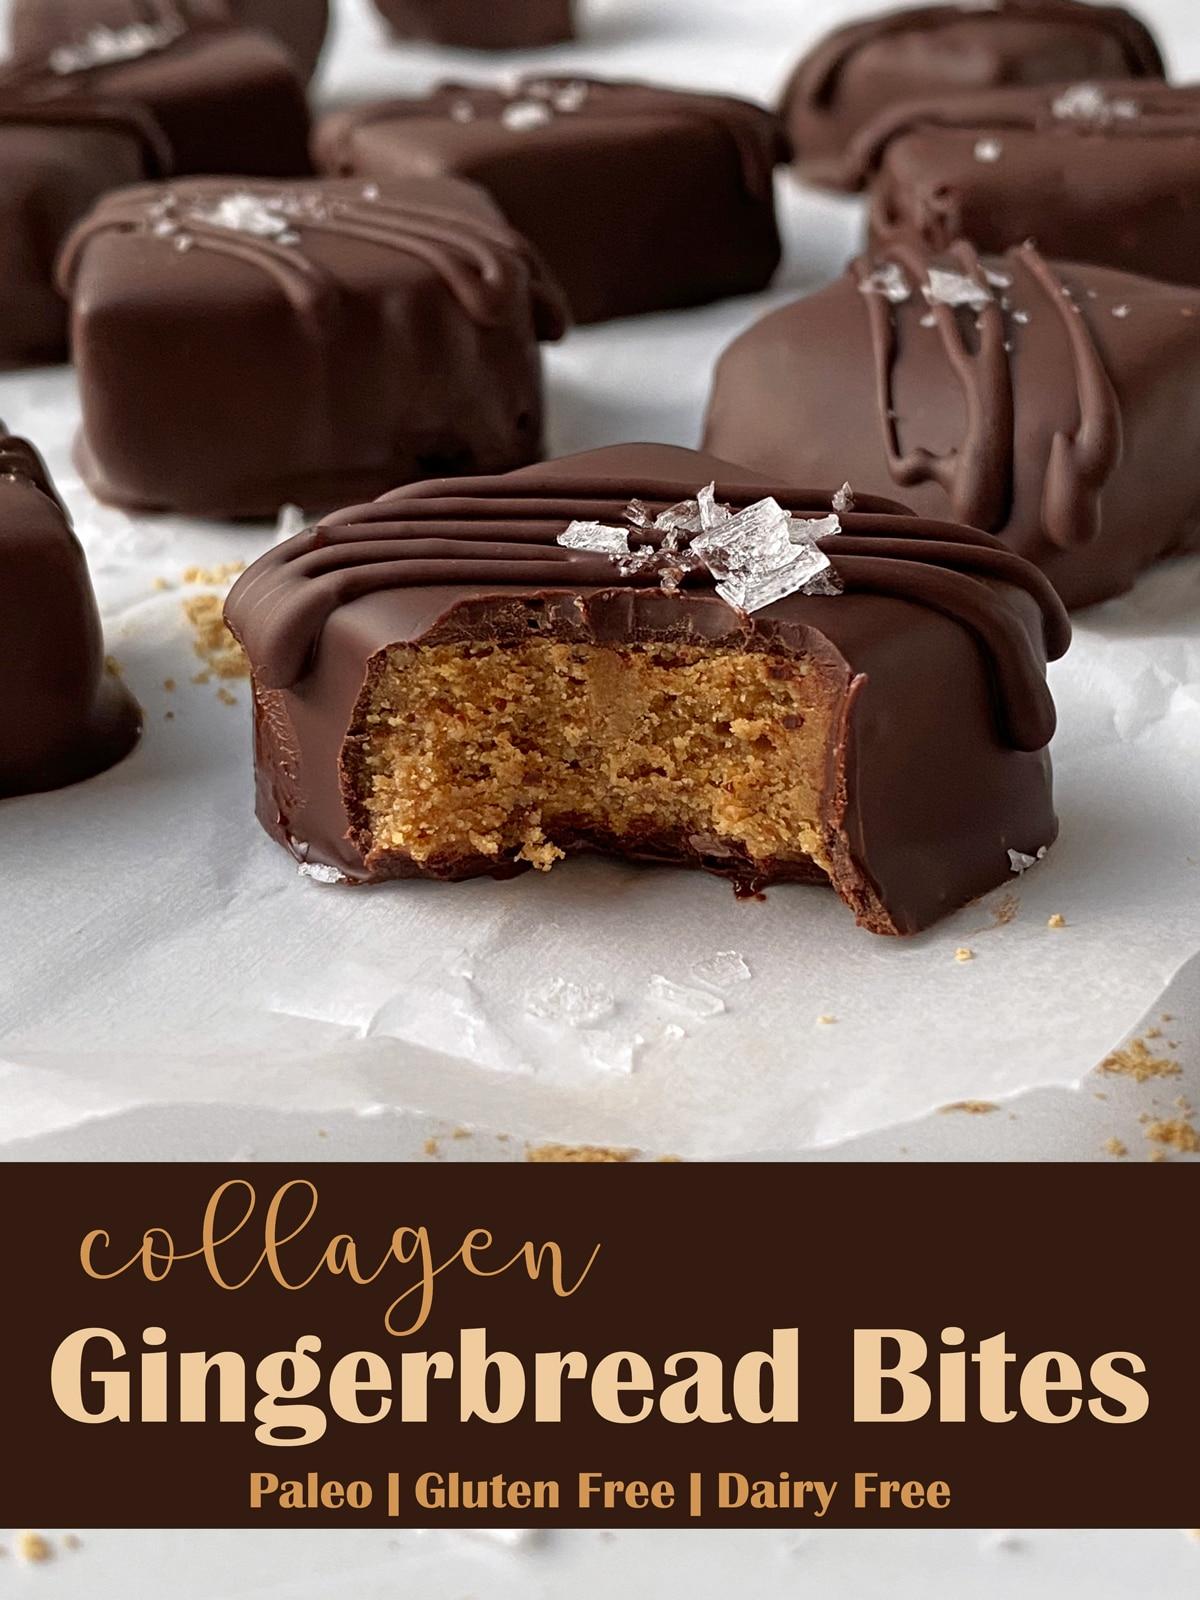 Collagen-Gingerbread-Bites